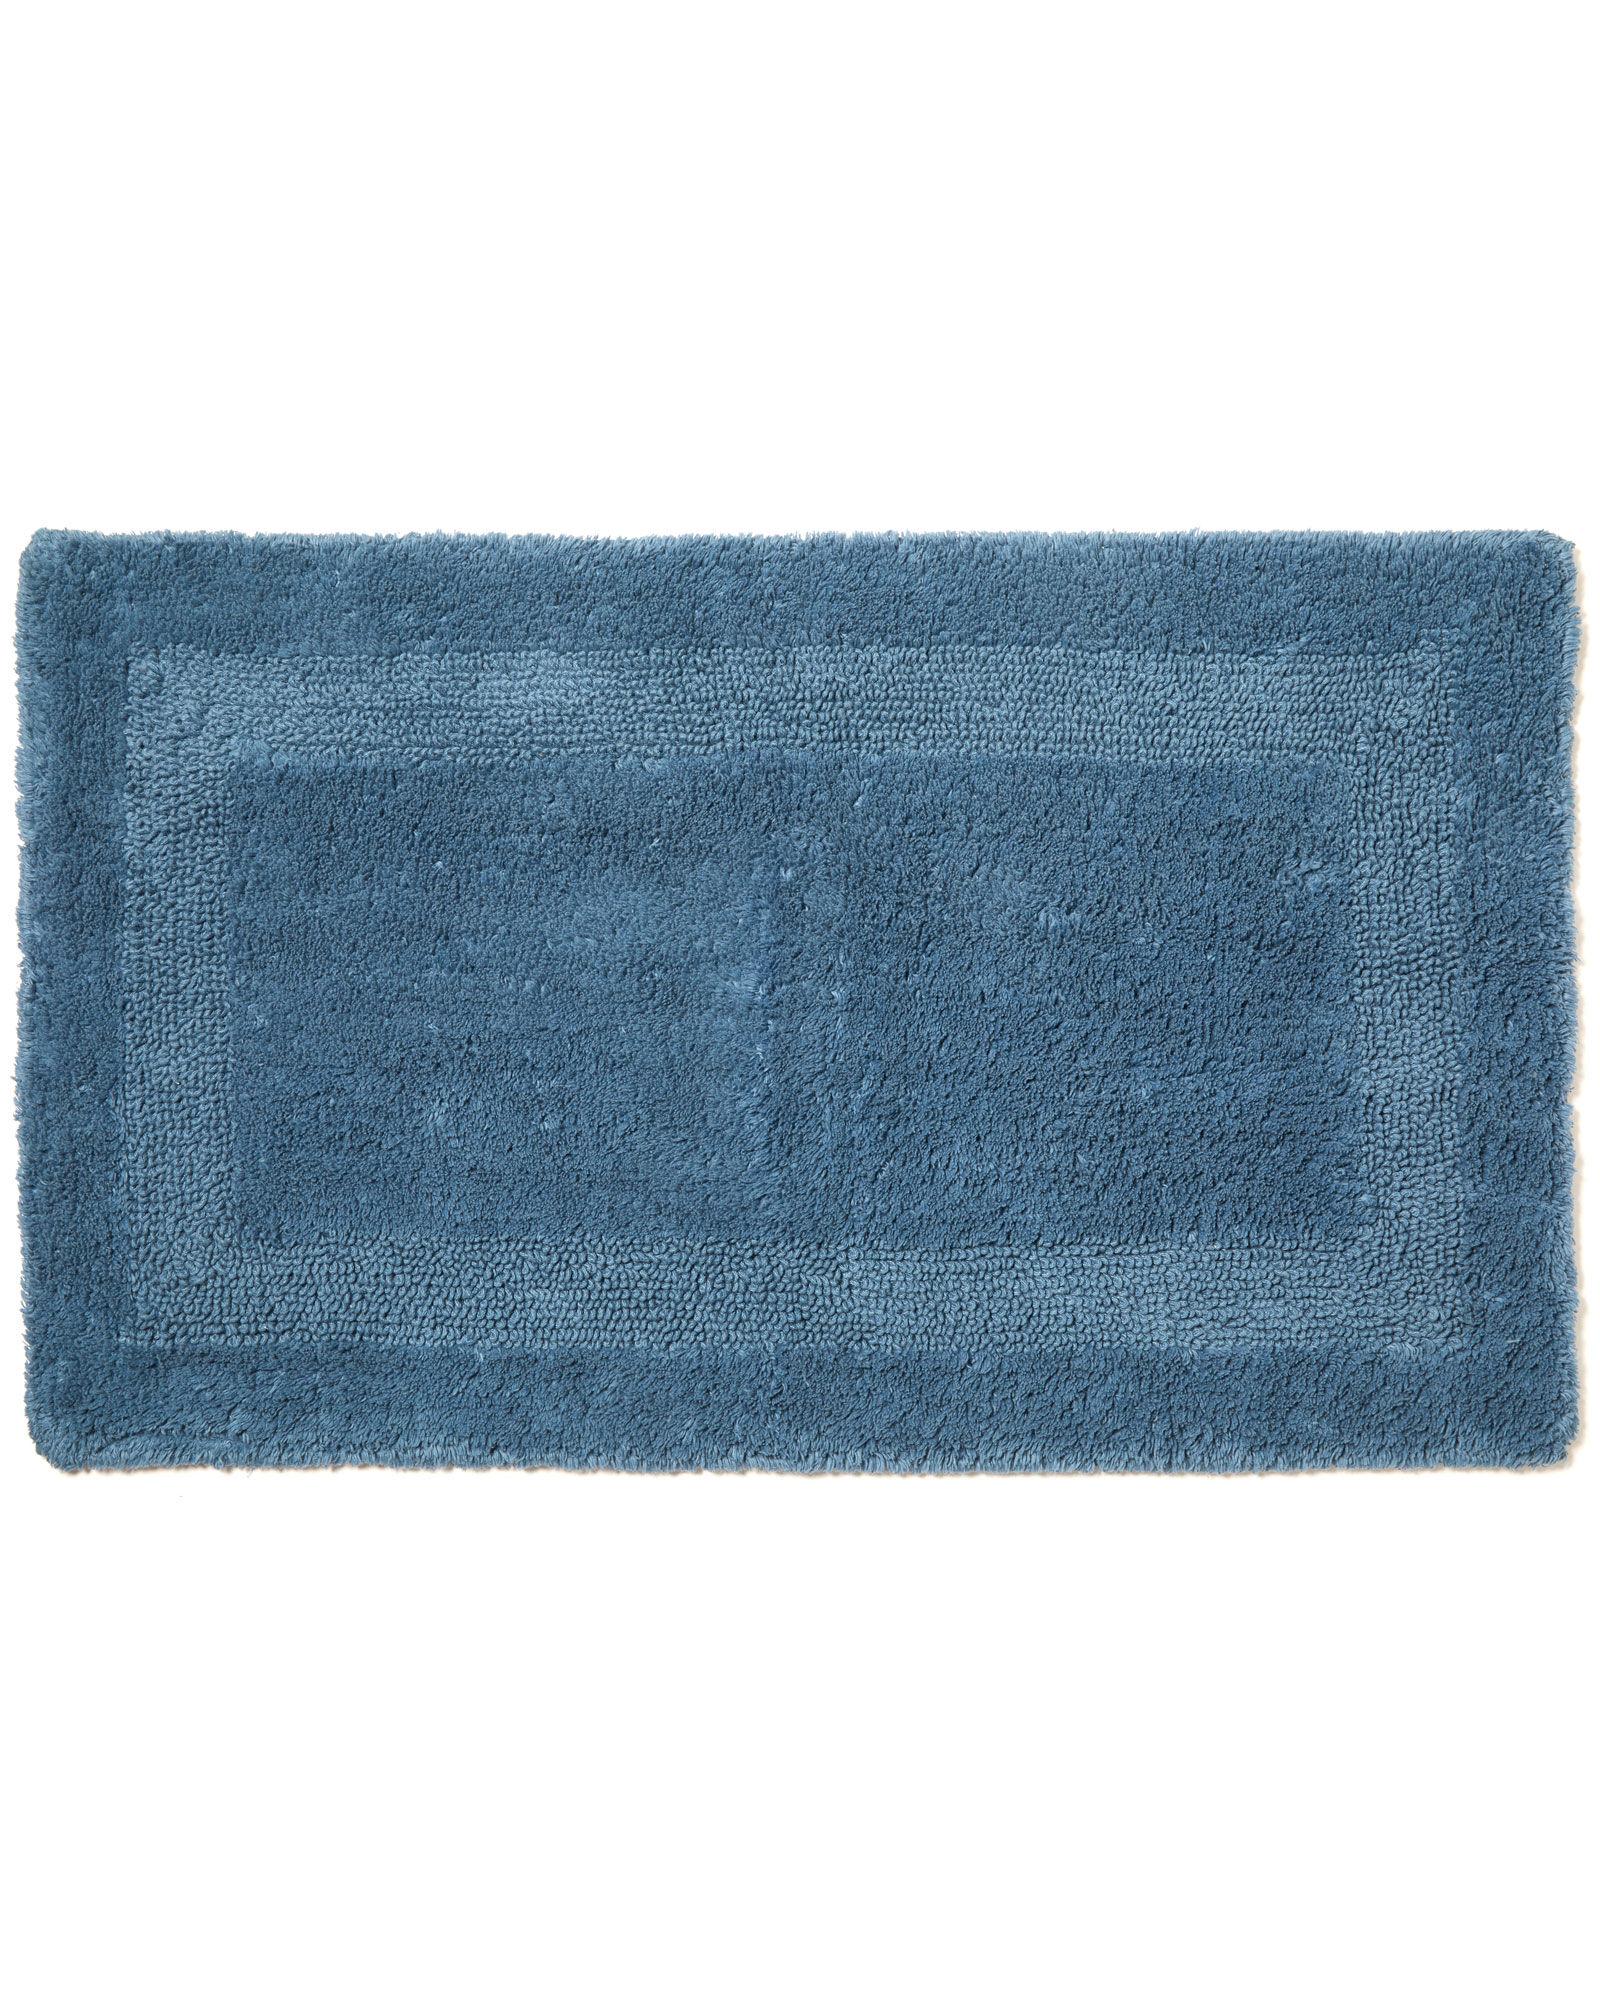 Bliss Pima luxury super soft absorbent stylish Bath sheet Petrol